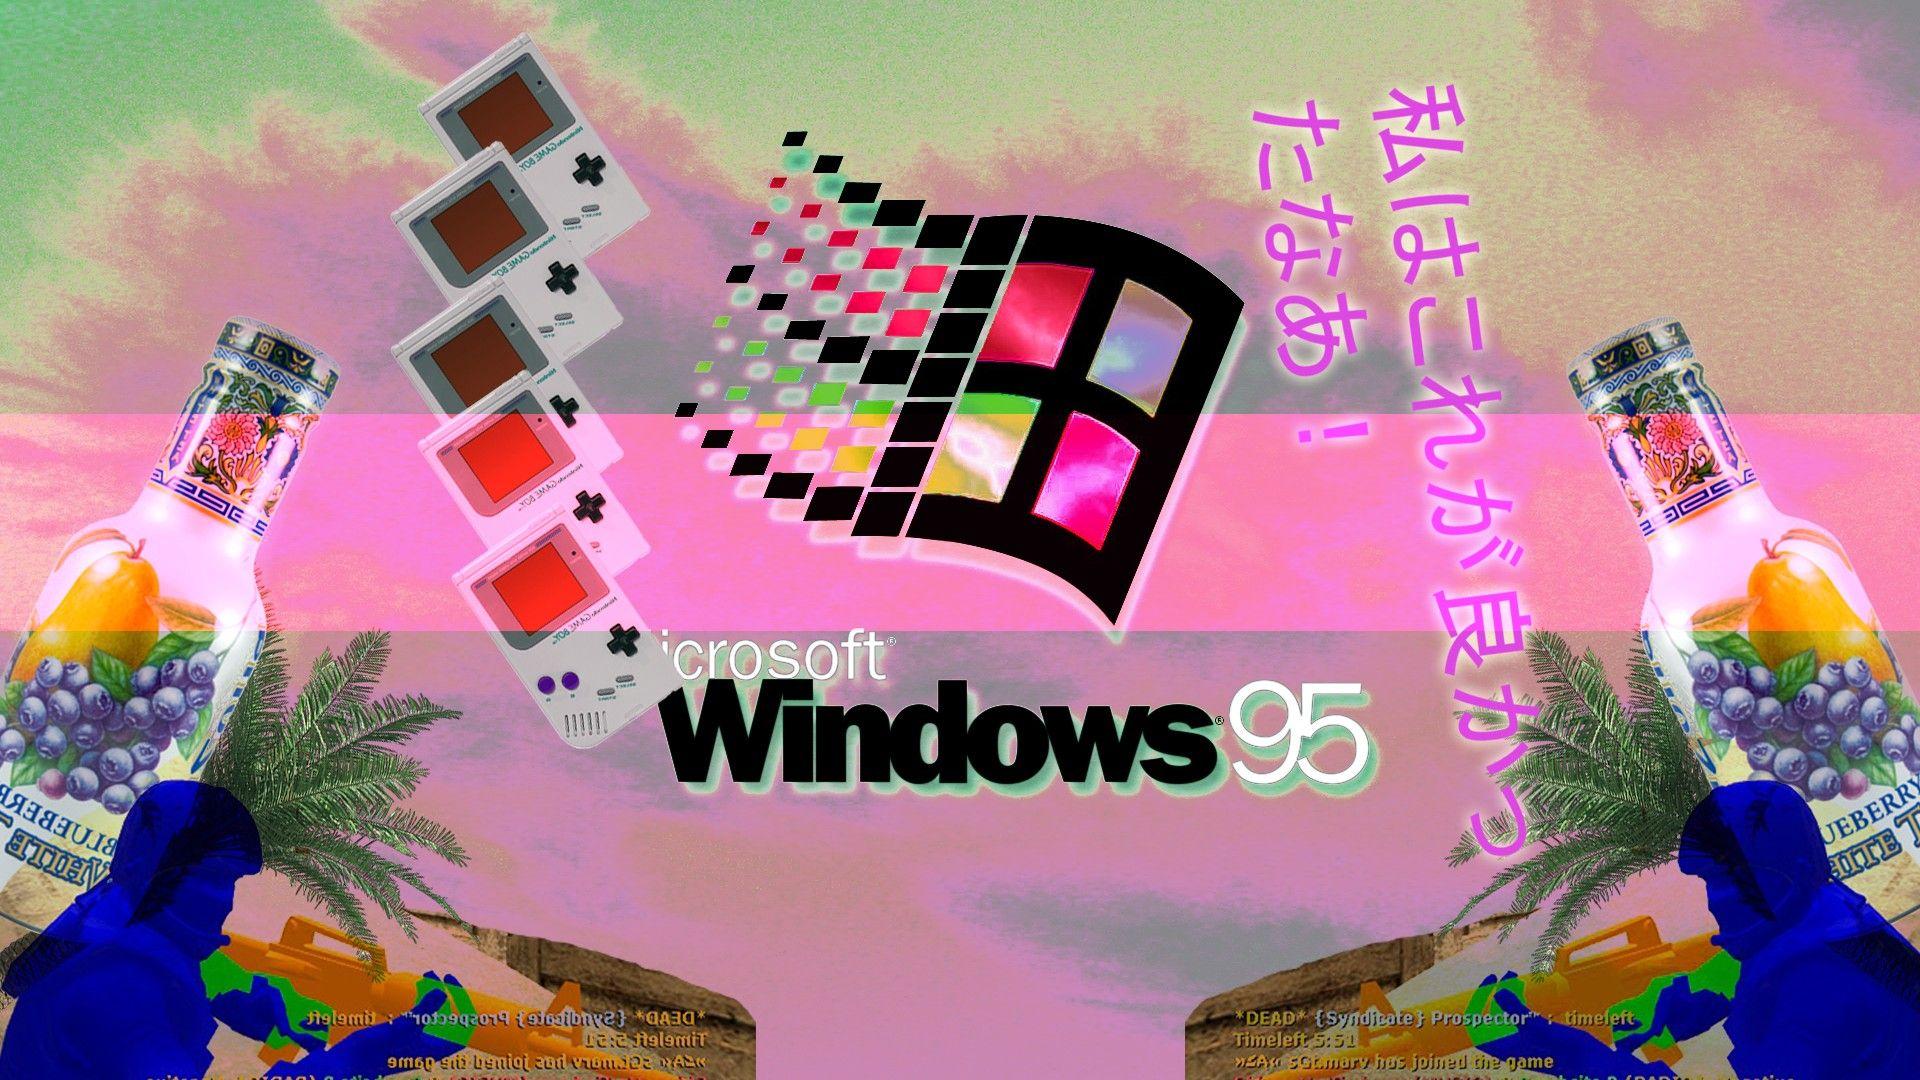 best vaporwave wallpaper 1920x1080 1920x1080 v a p o r w a v e in